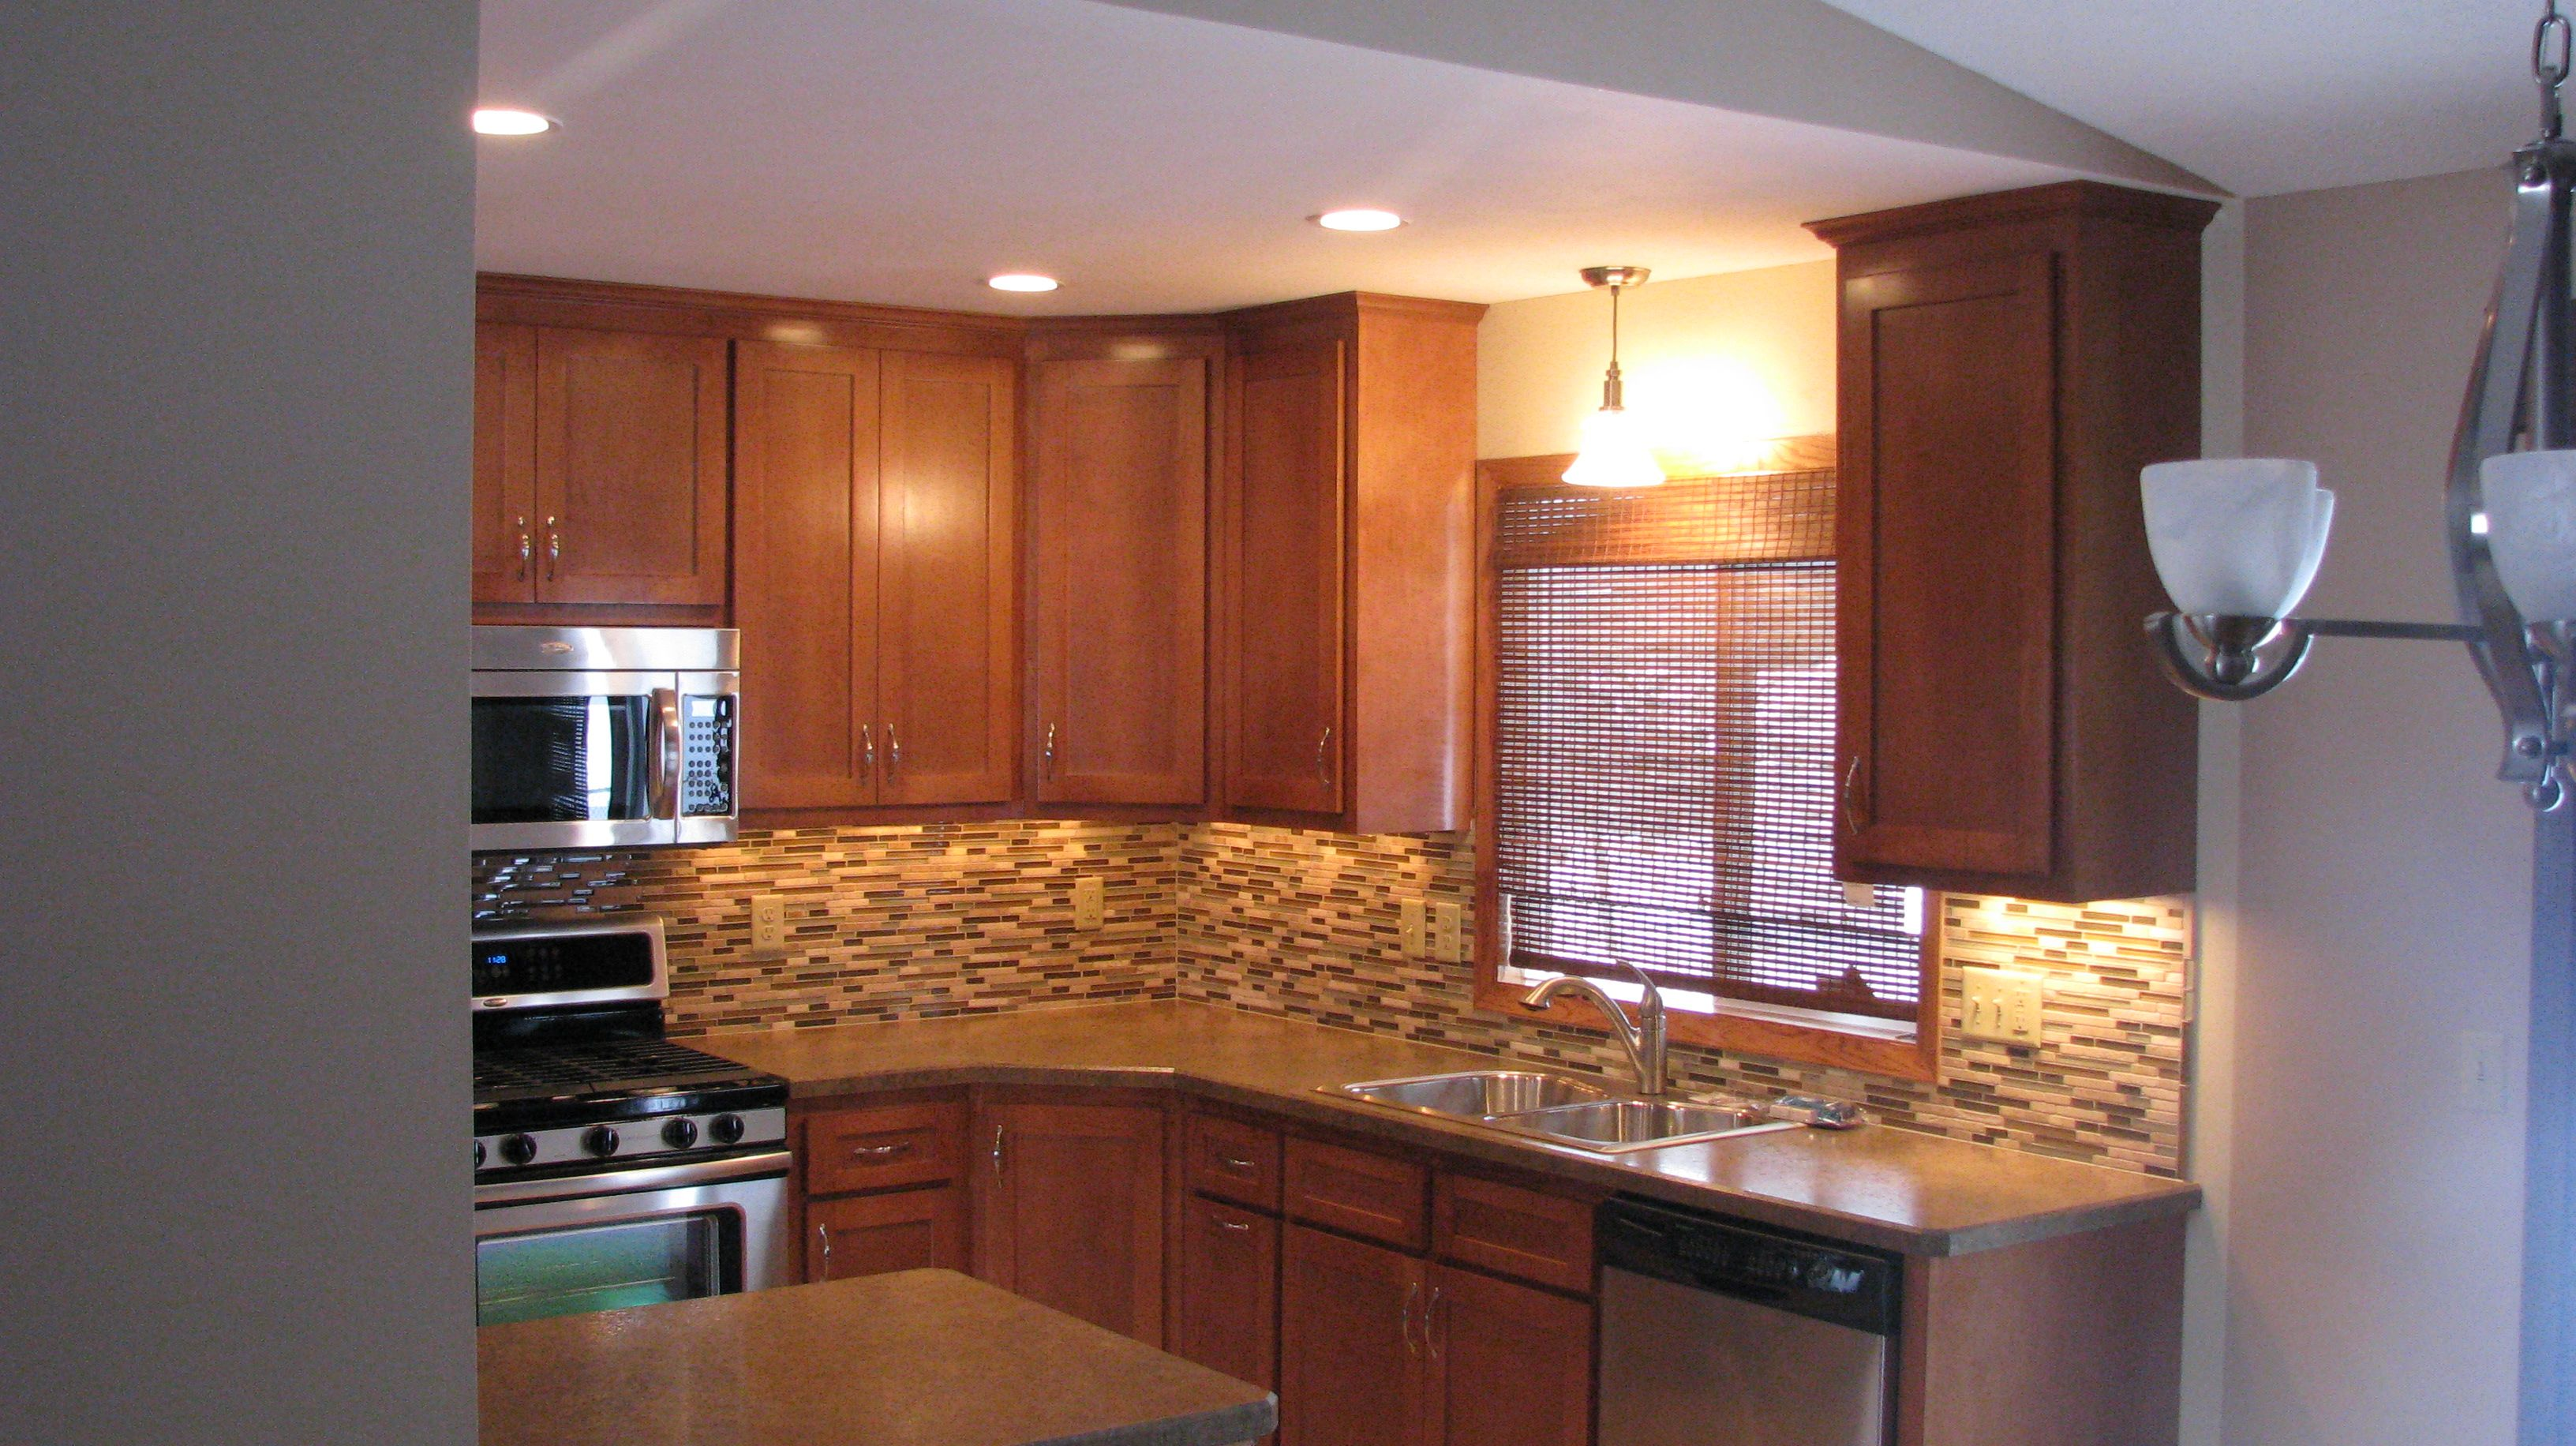 remodel my kitchen decorative tile backsplash split foyer renovation ideas on pinterest raised ranch